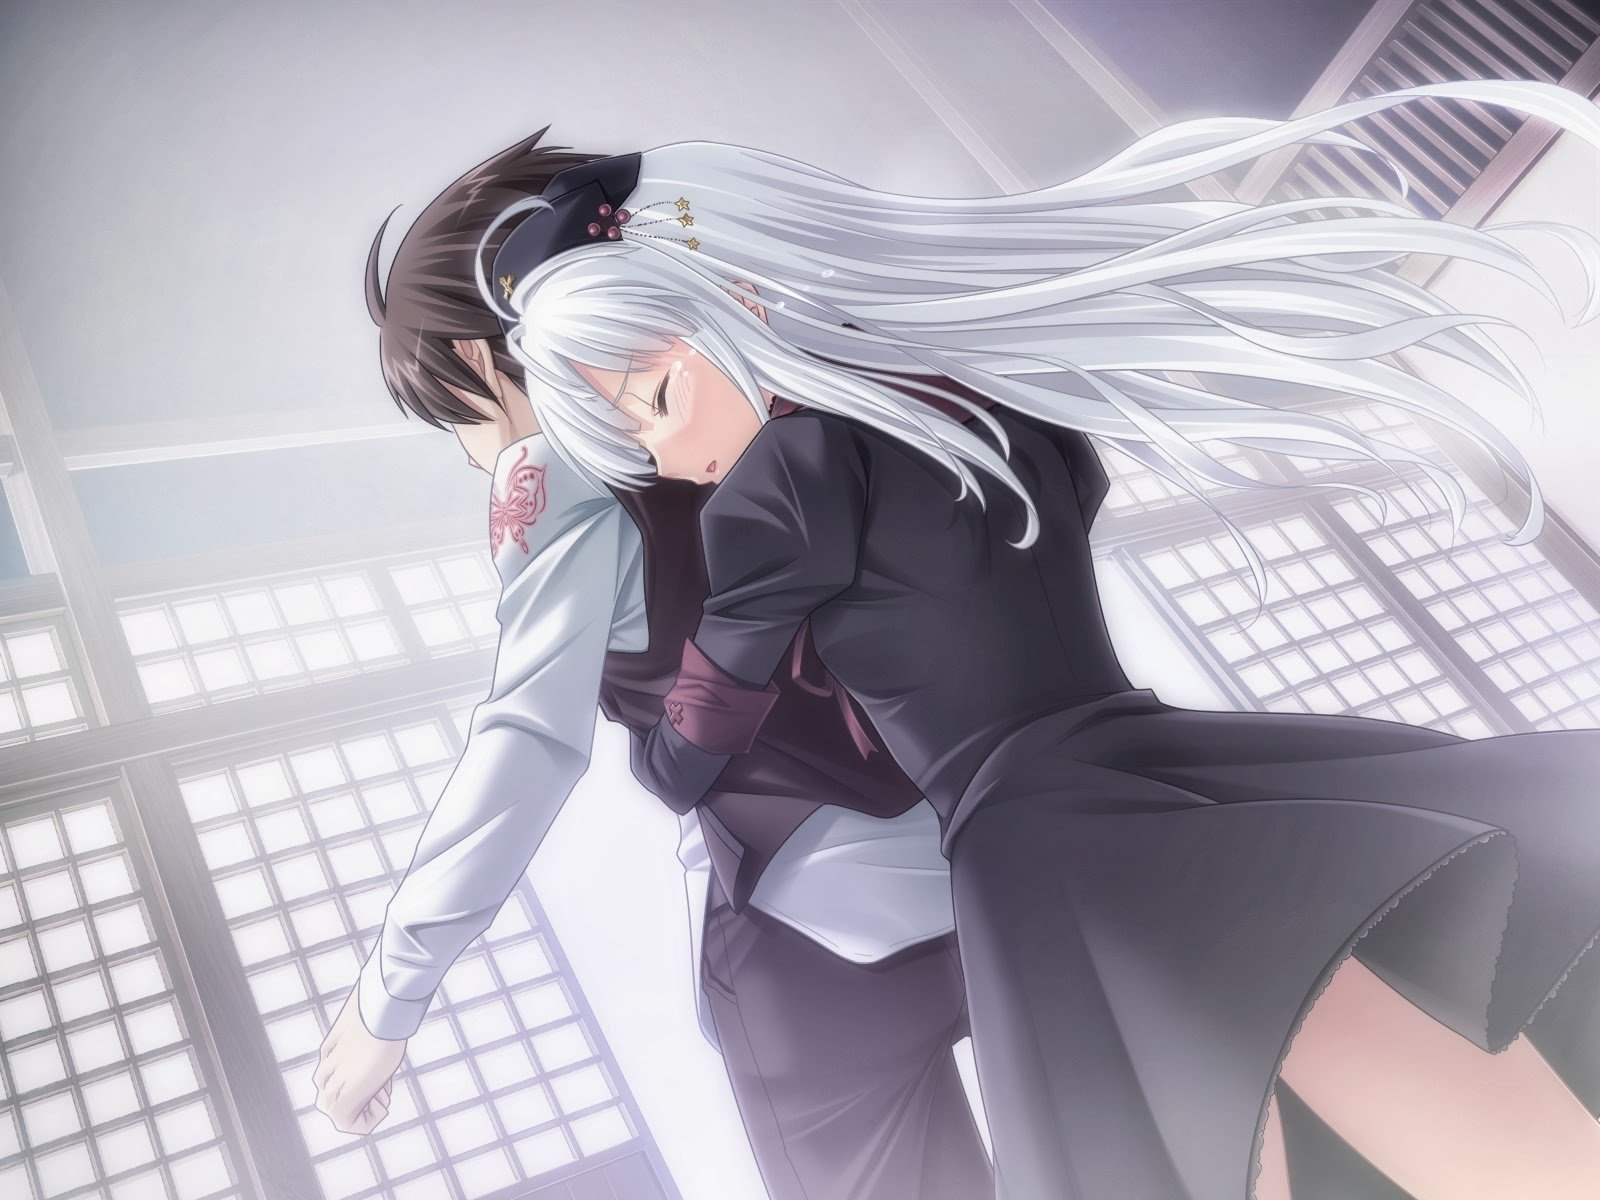 Anime couple hug from the back